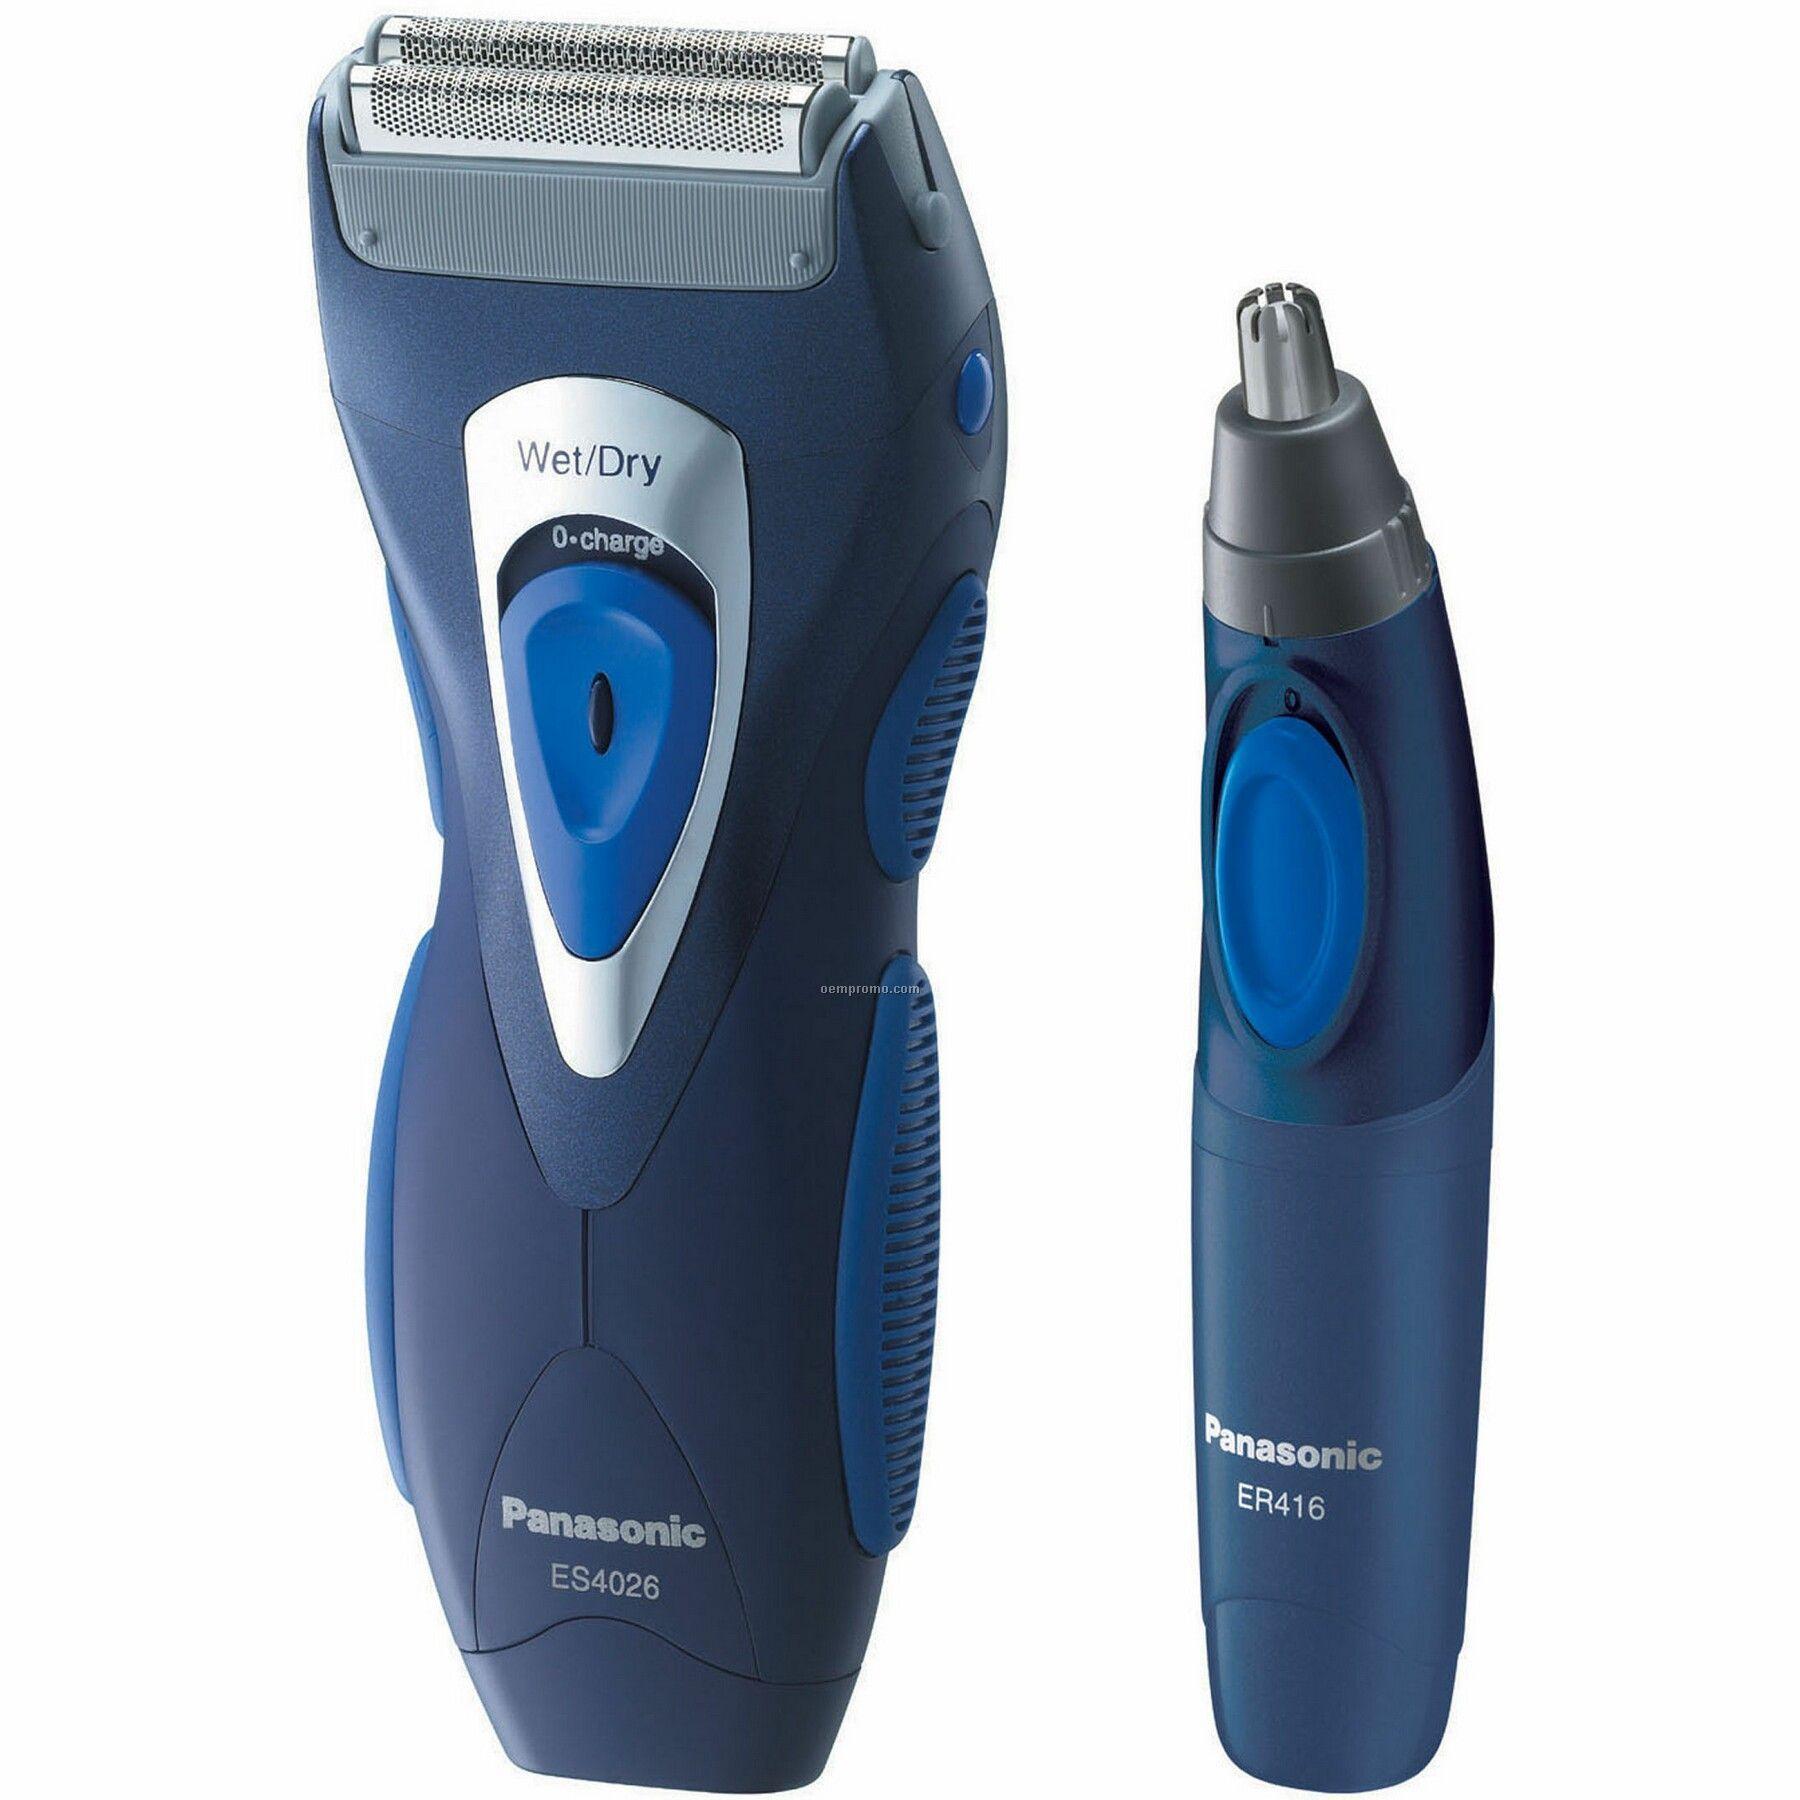 Panasonic Pro-curve Double Blade Men's Shaver/ Trimmer Gift Set